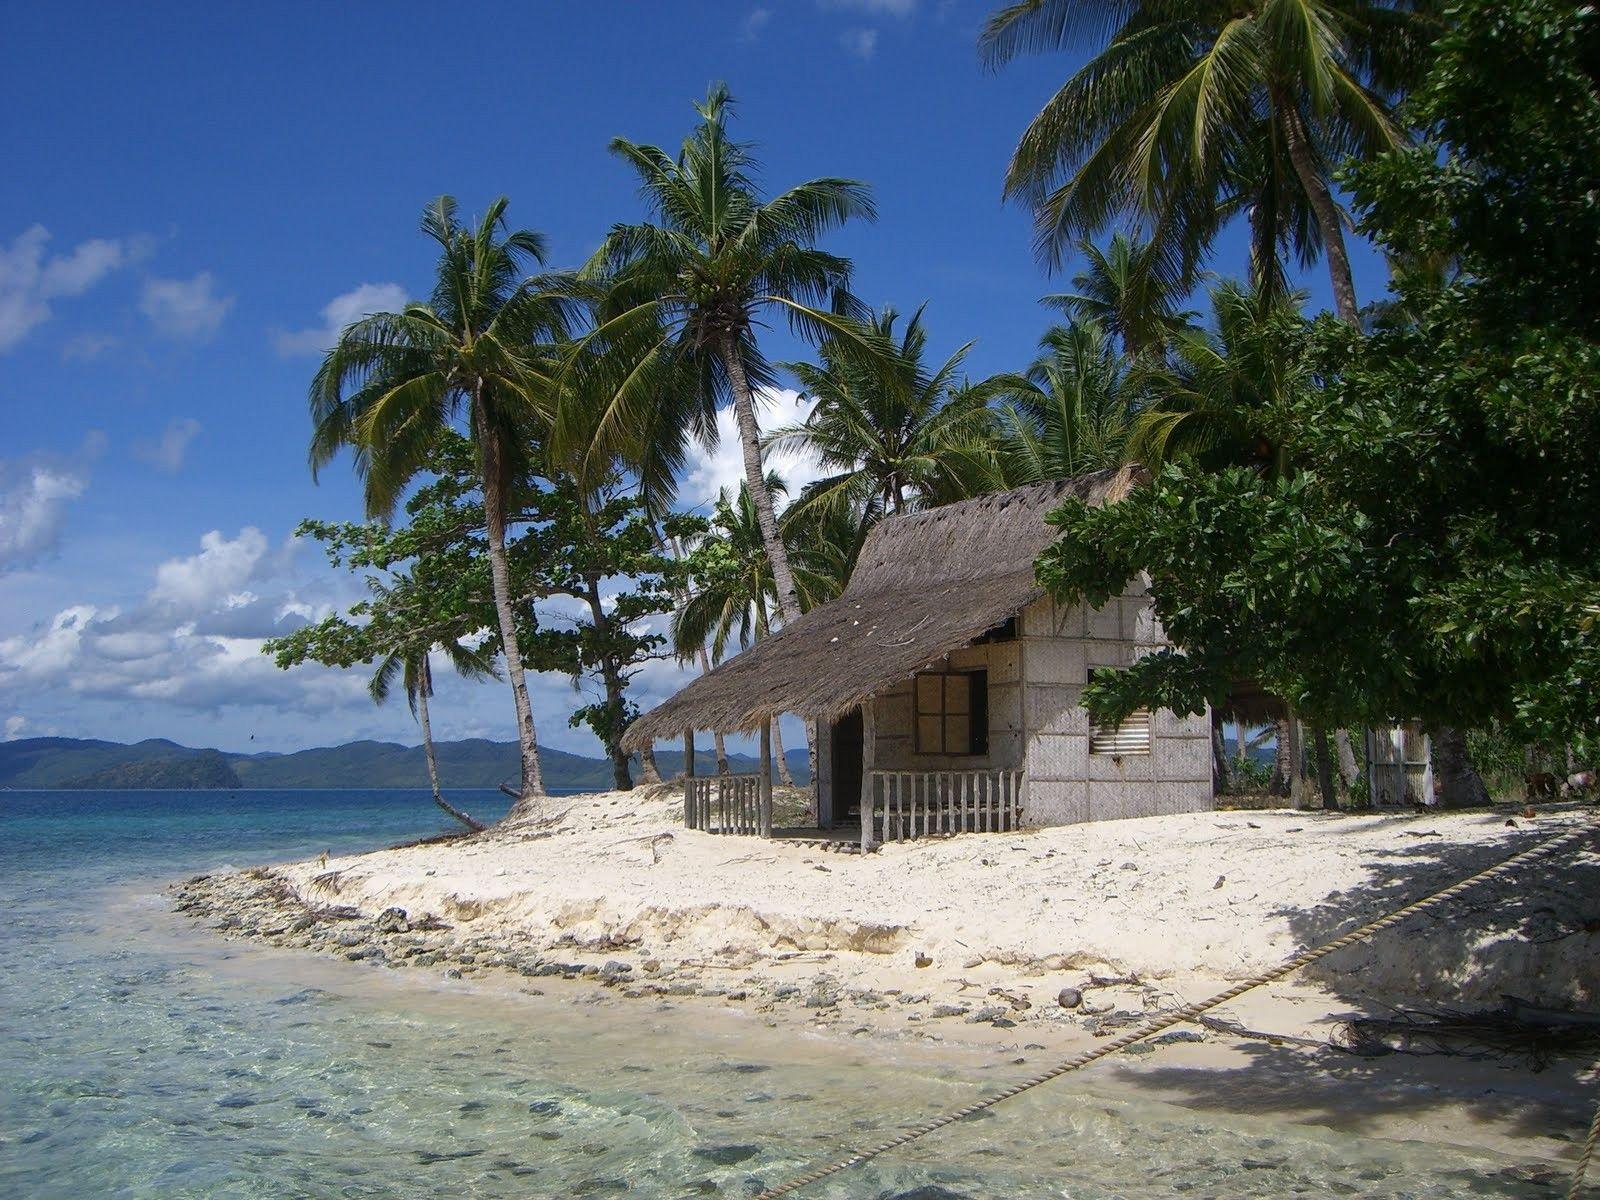 Tropical Island Beach Hut: Island Hut In The Philippines